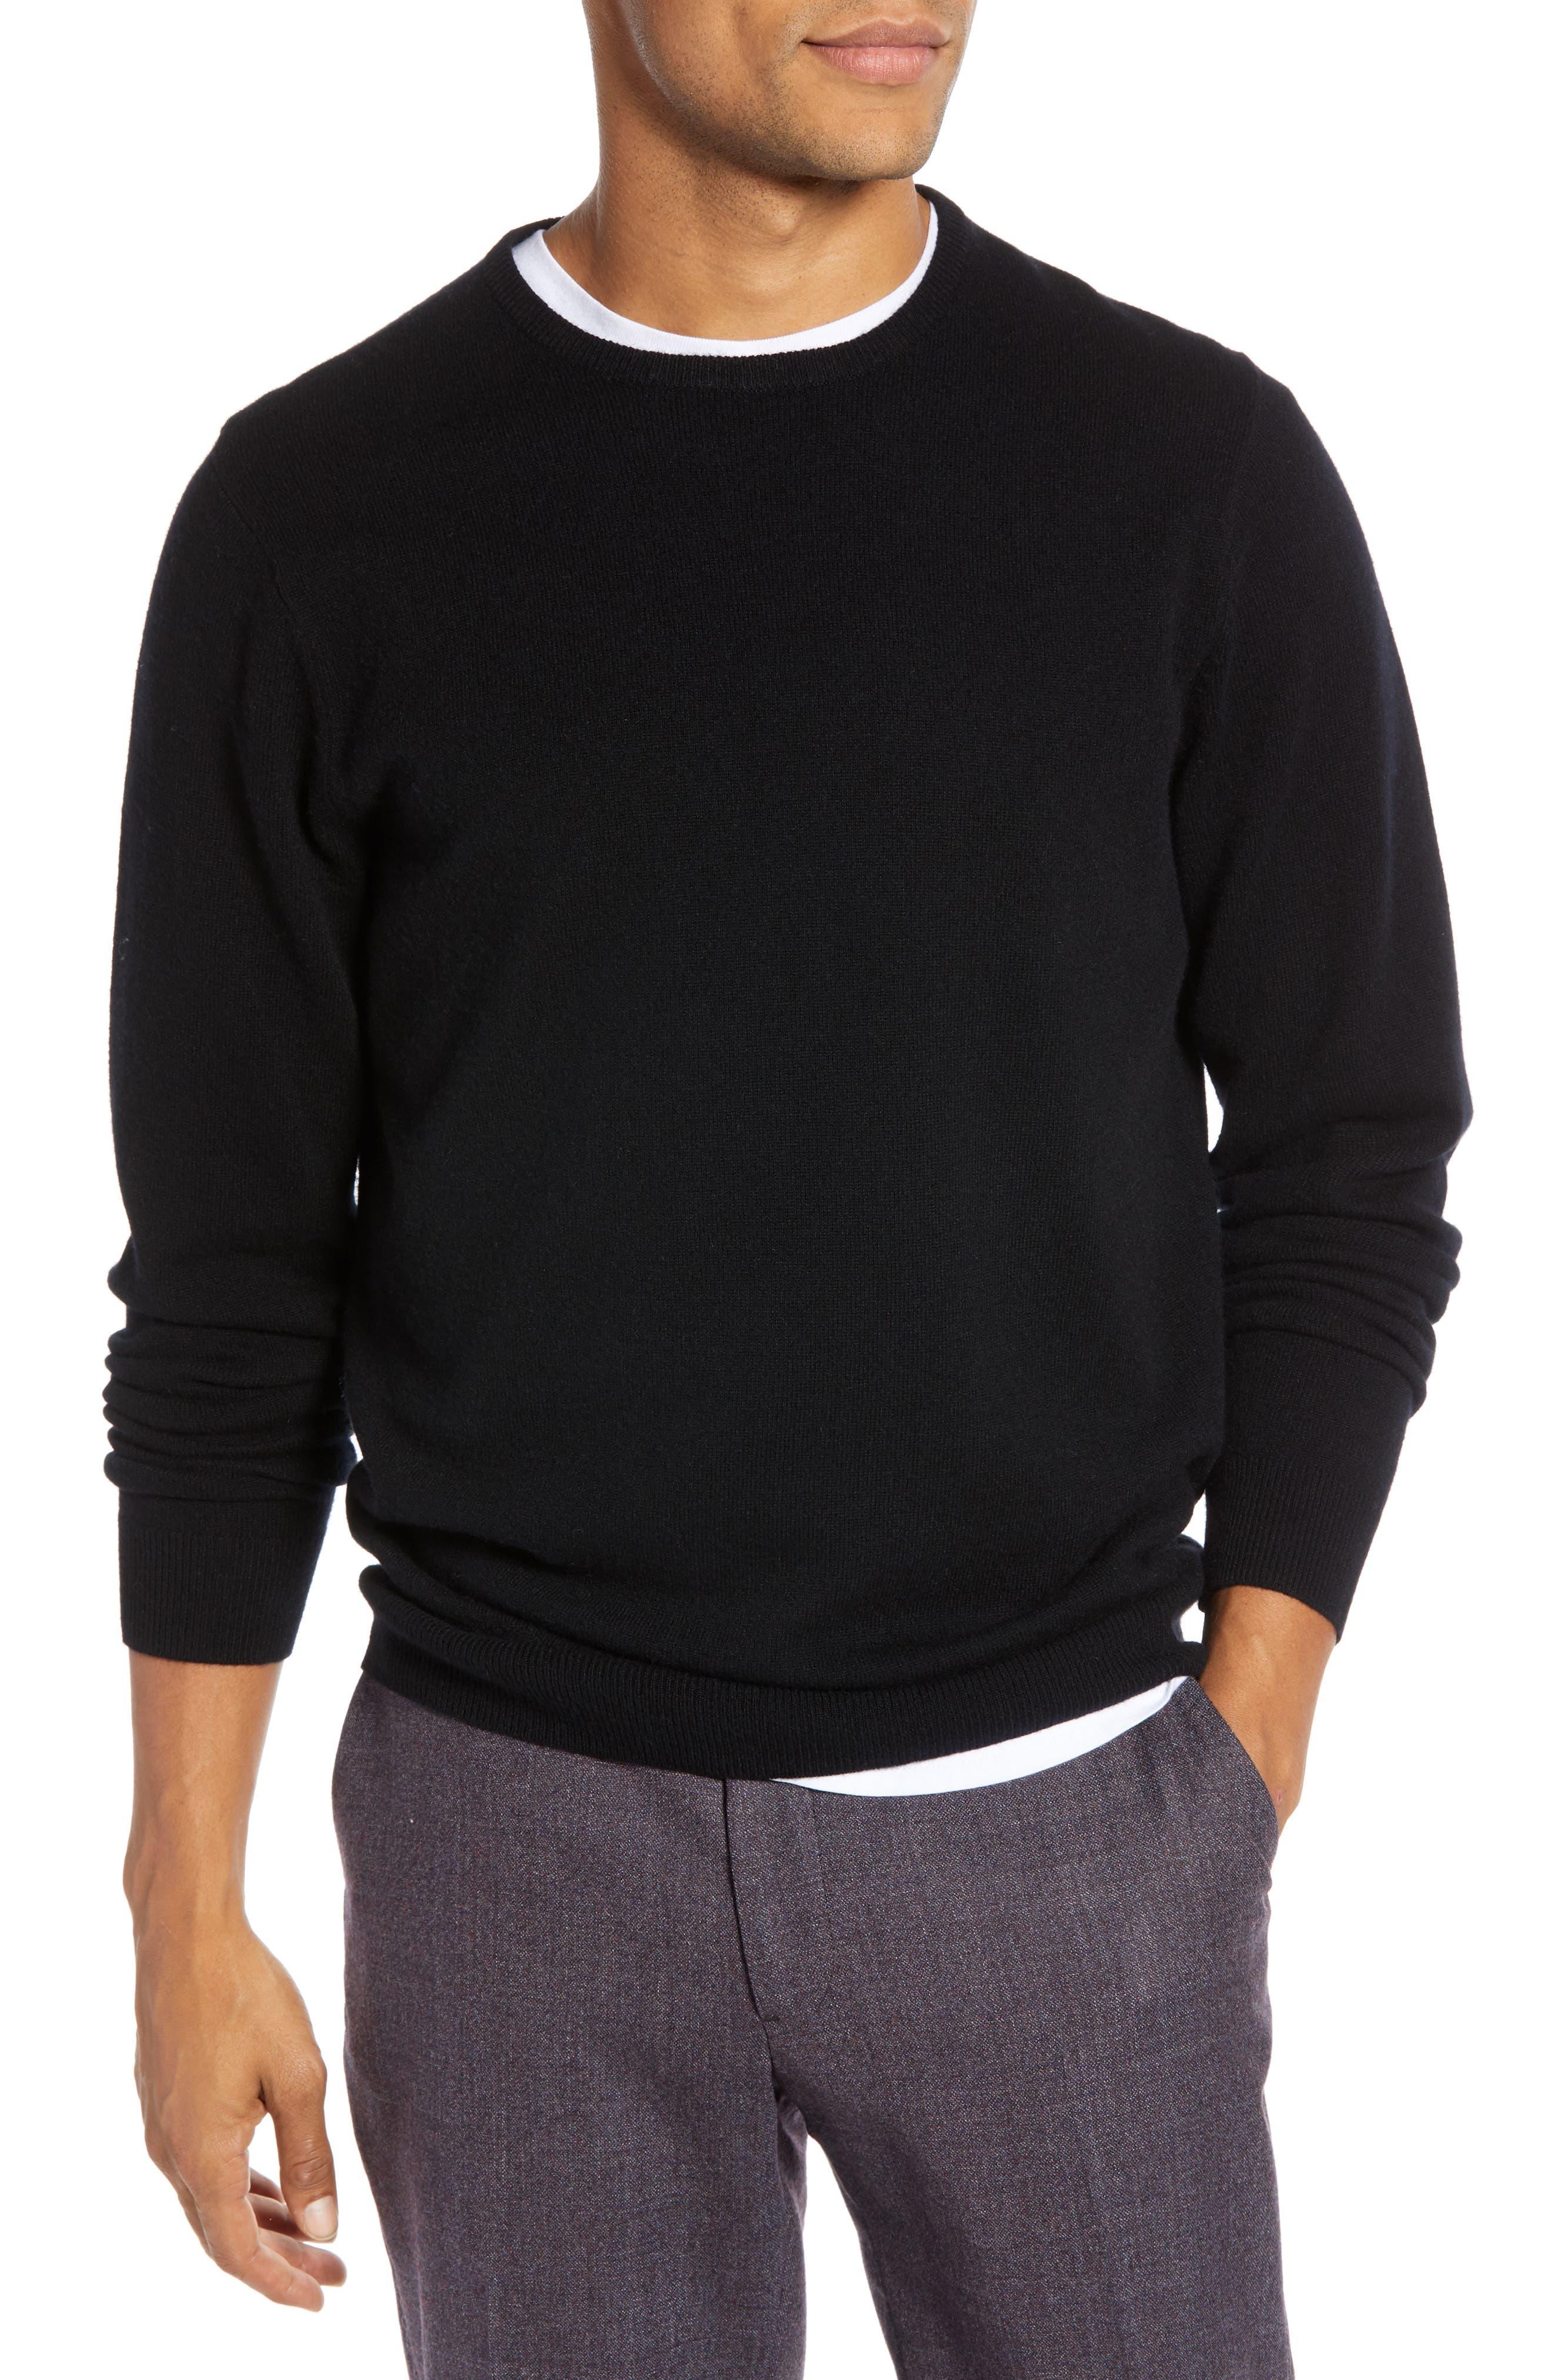 Regular Fit Wool & Cashmere Sweater,                         Main,                         color, BLACK CAVIAR